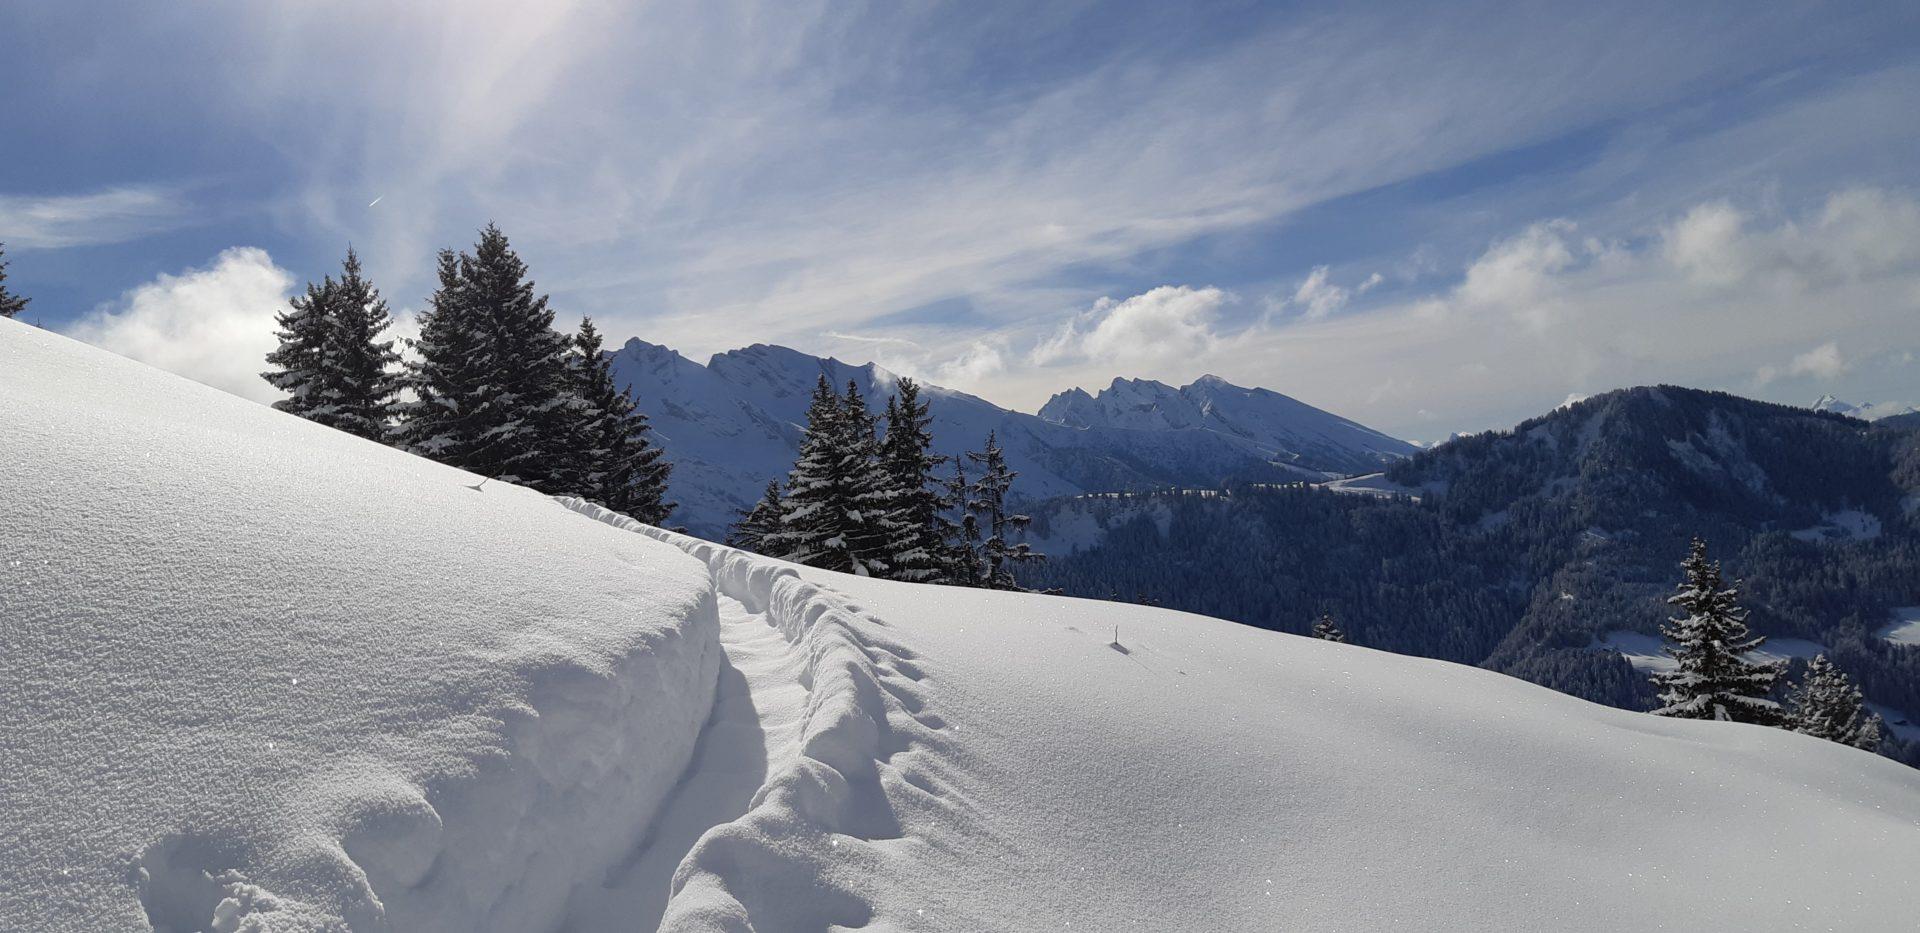 neige et paysage